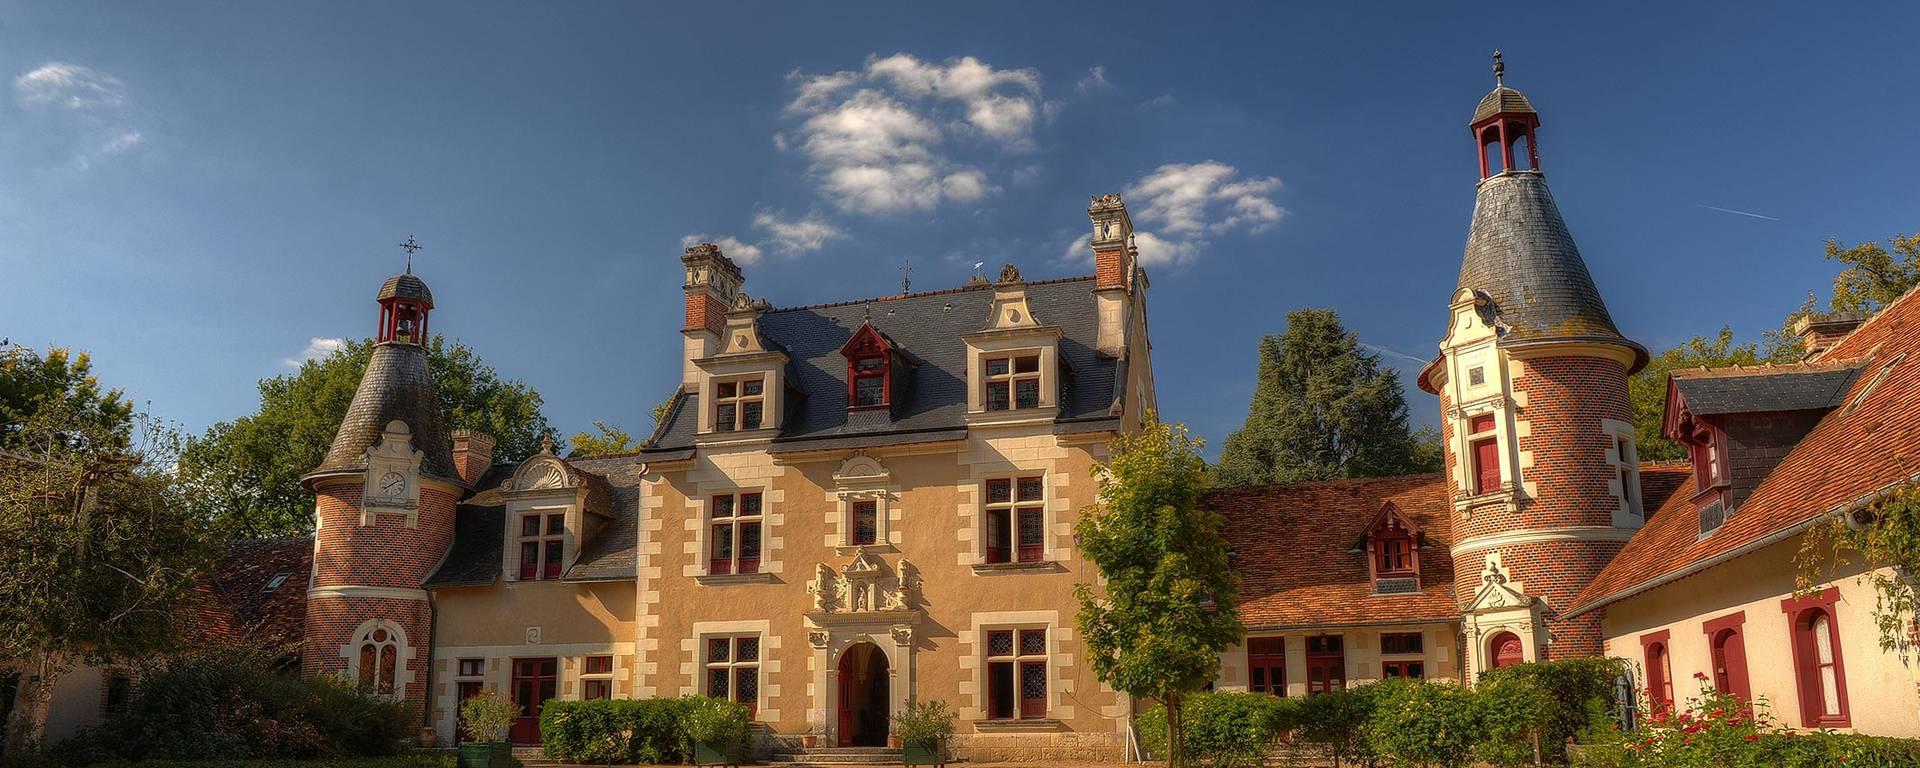 The courtyard of the Château de Troussay